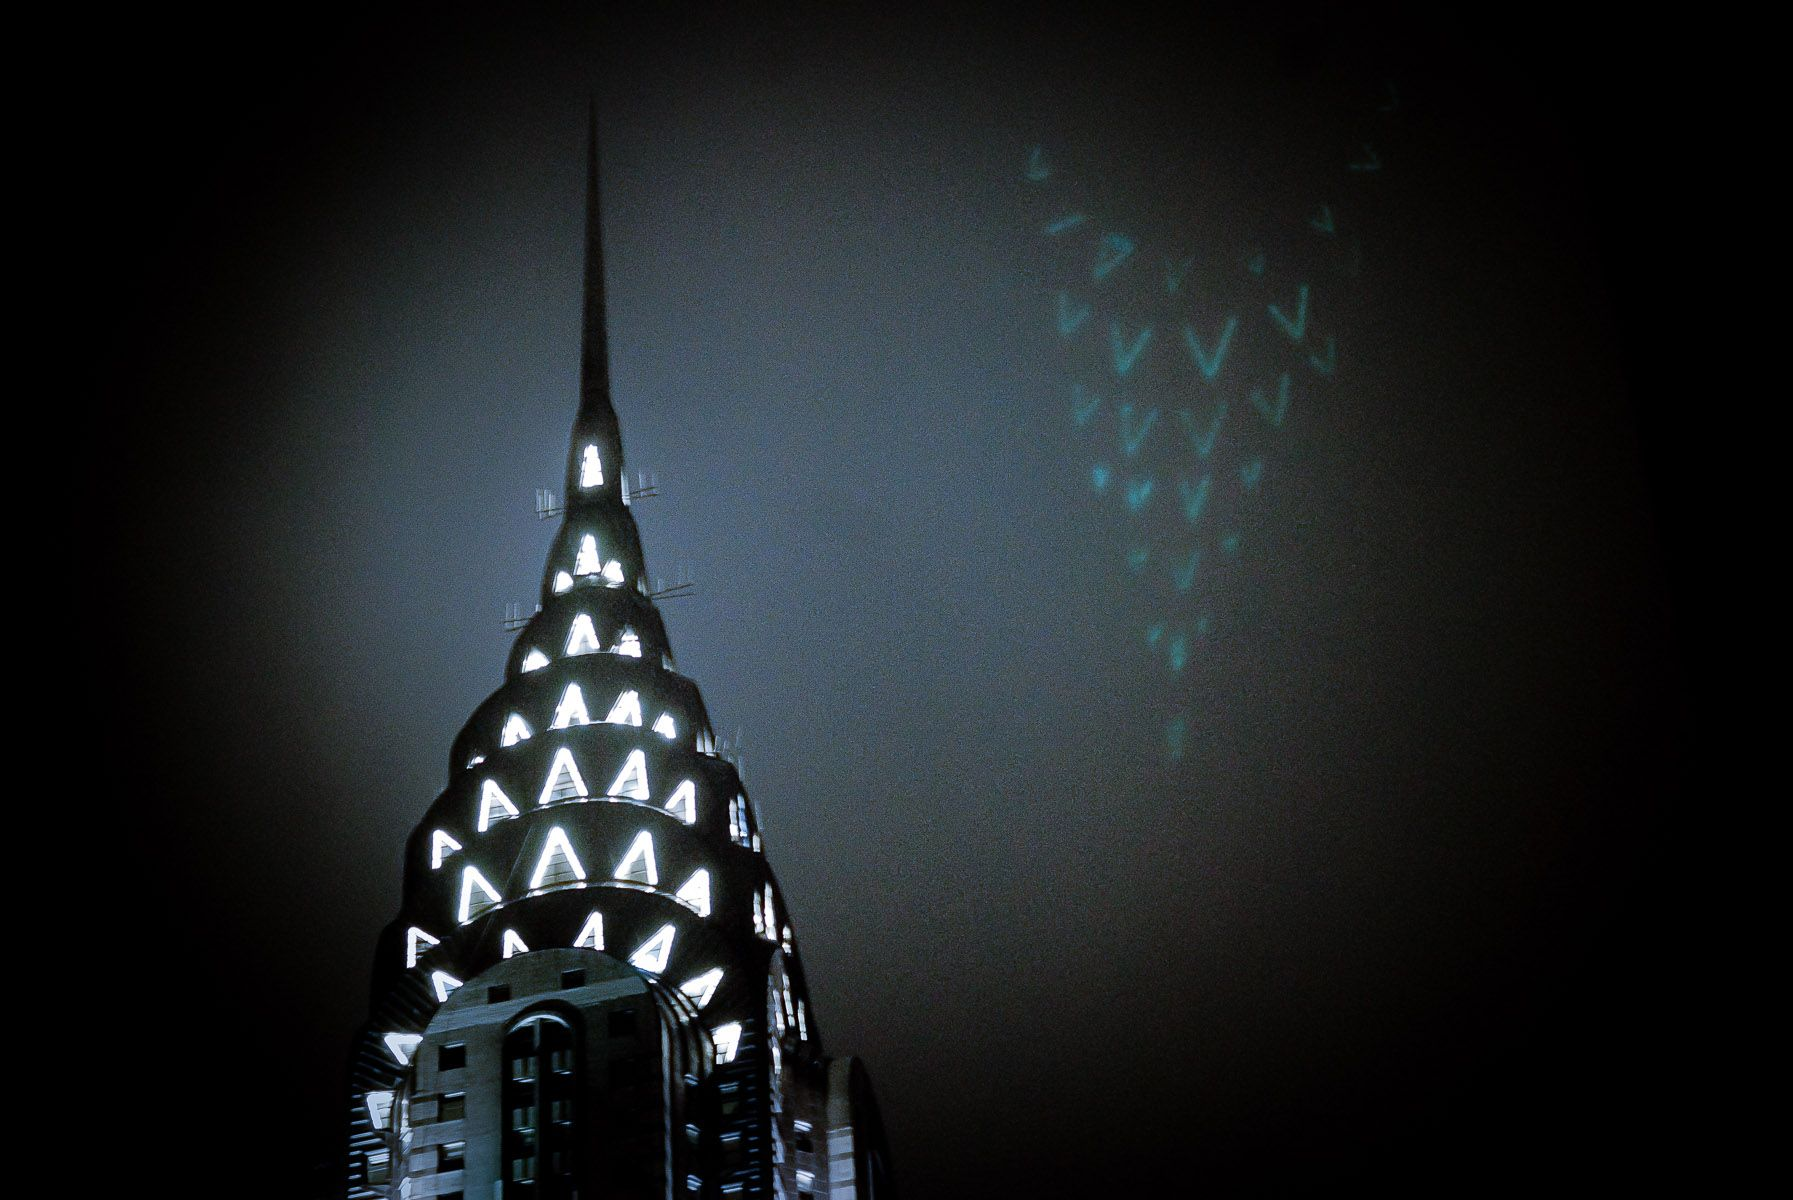 Chrysler Building | New York, NY